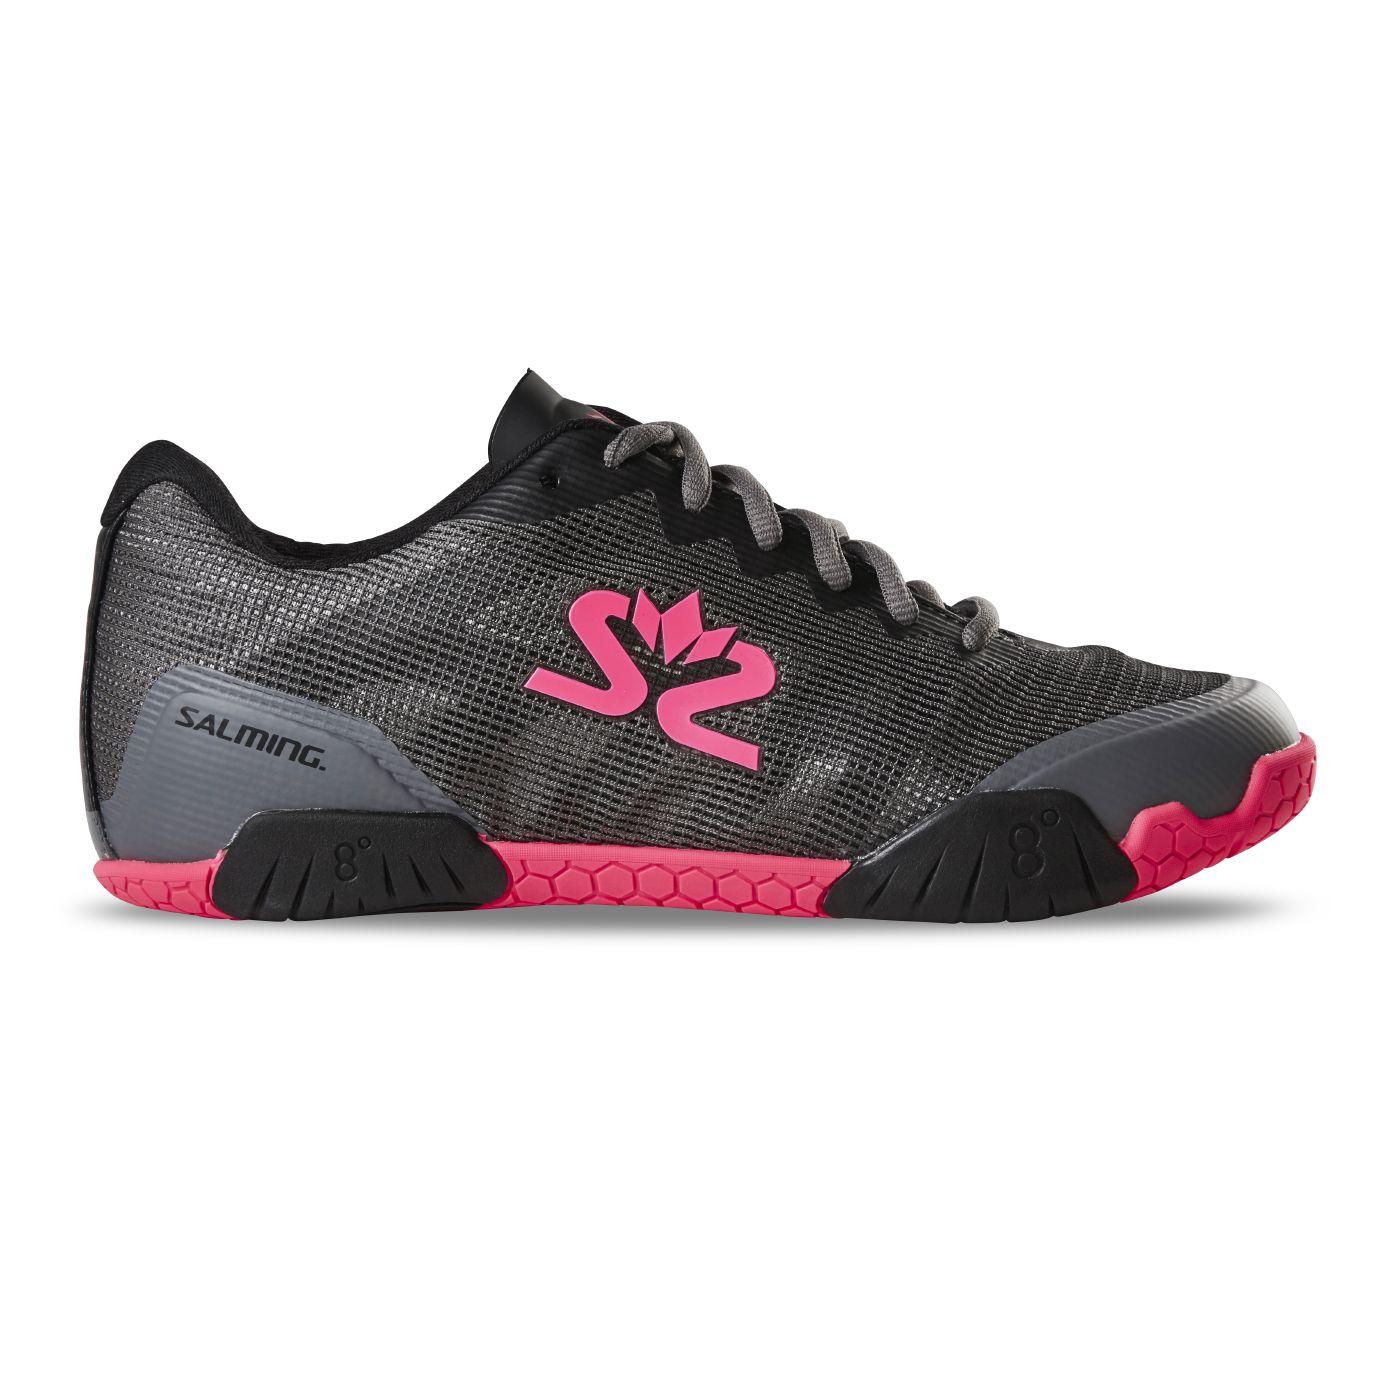 Salming Hawk Shoe Women GunMetal/Pink 4,5 UK - 37 1/3 EUR - 23,5 cm